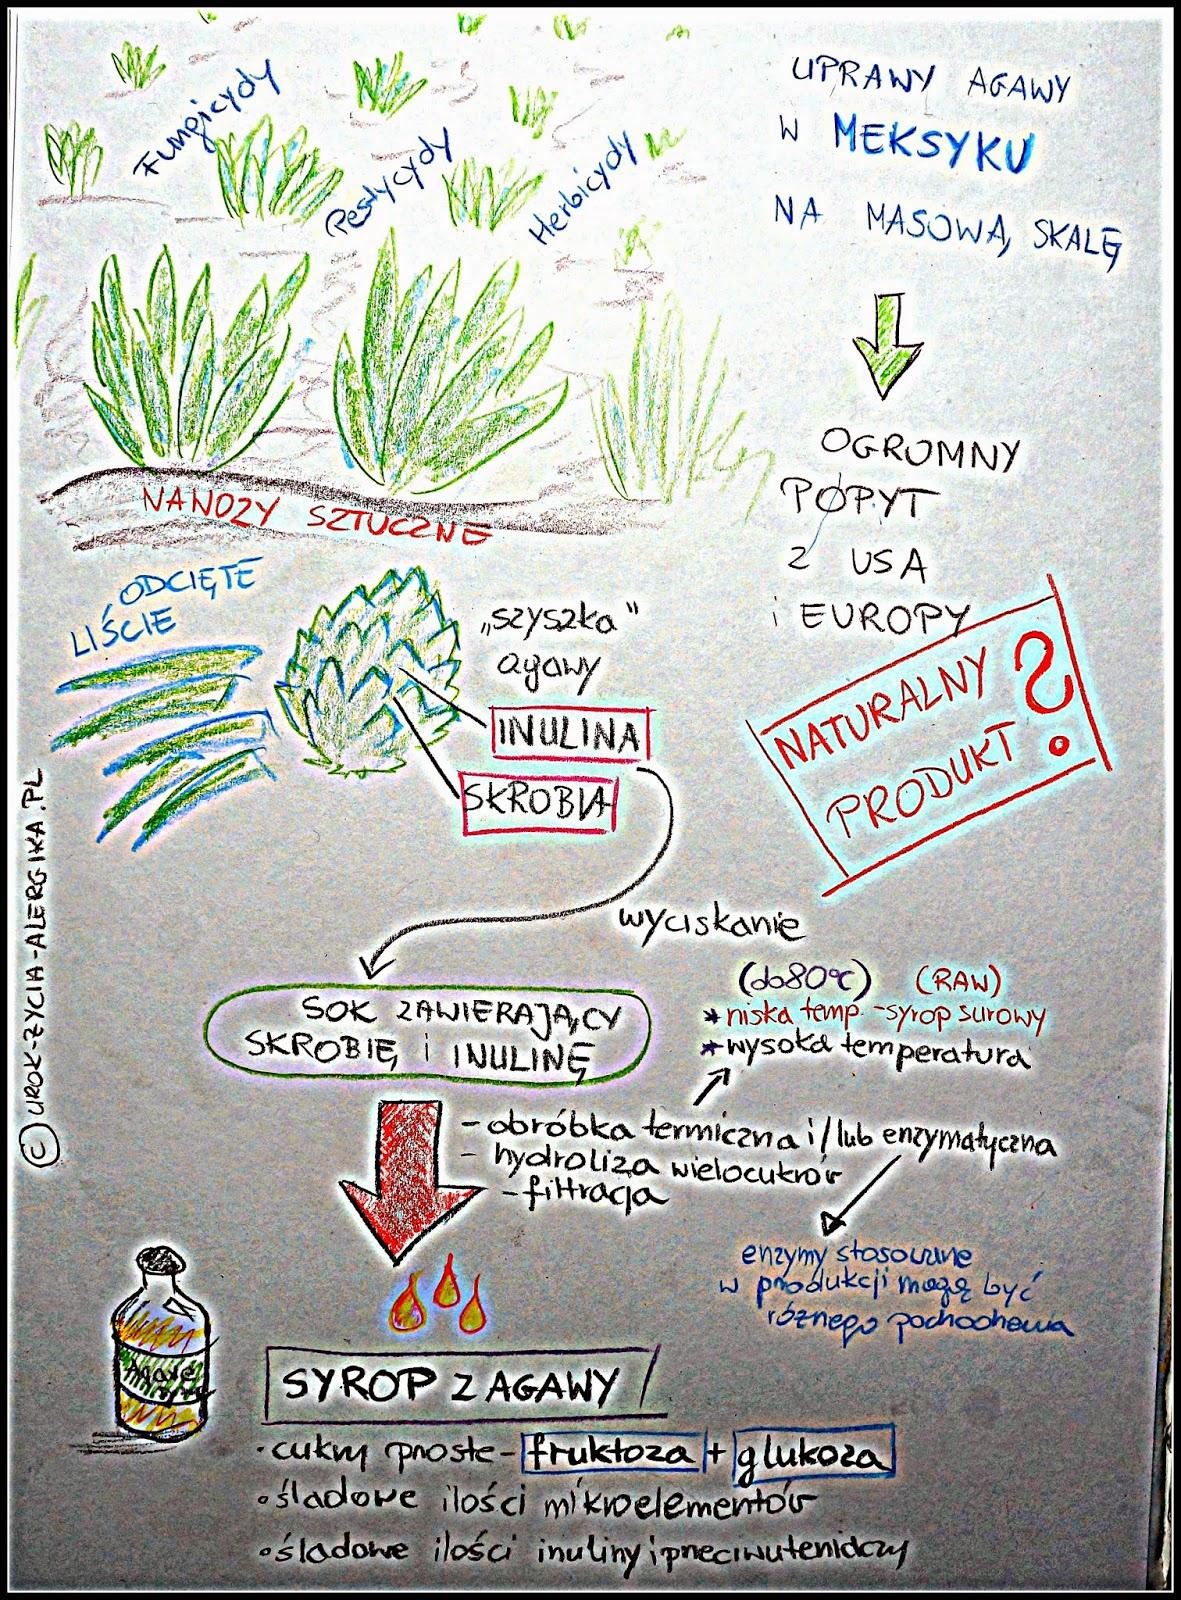 syrop z agawy schemat